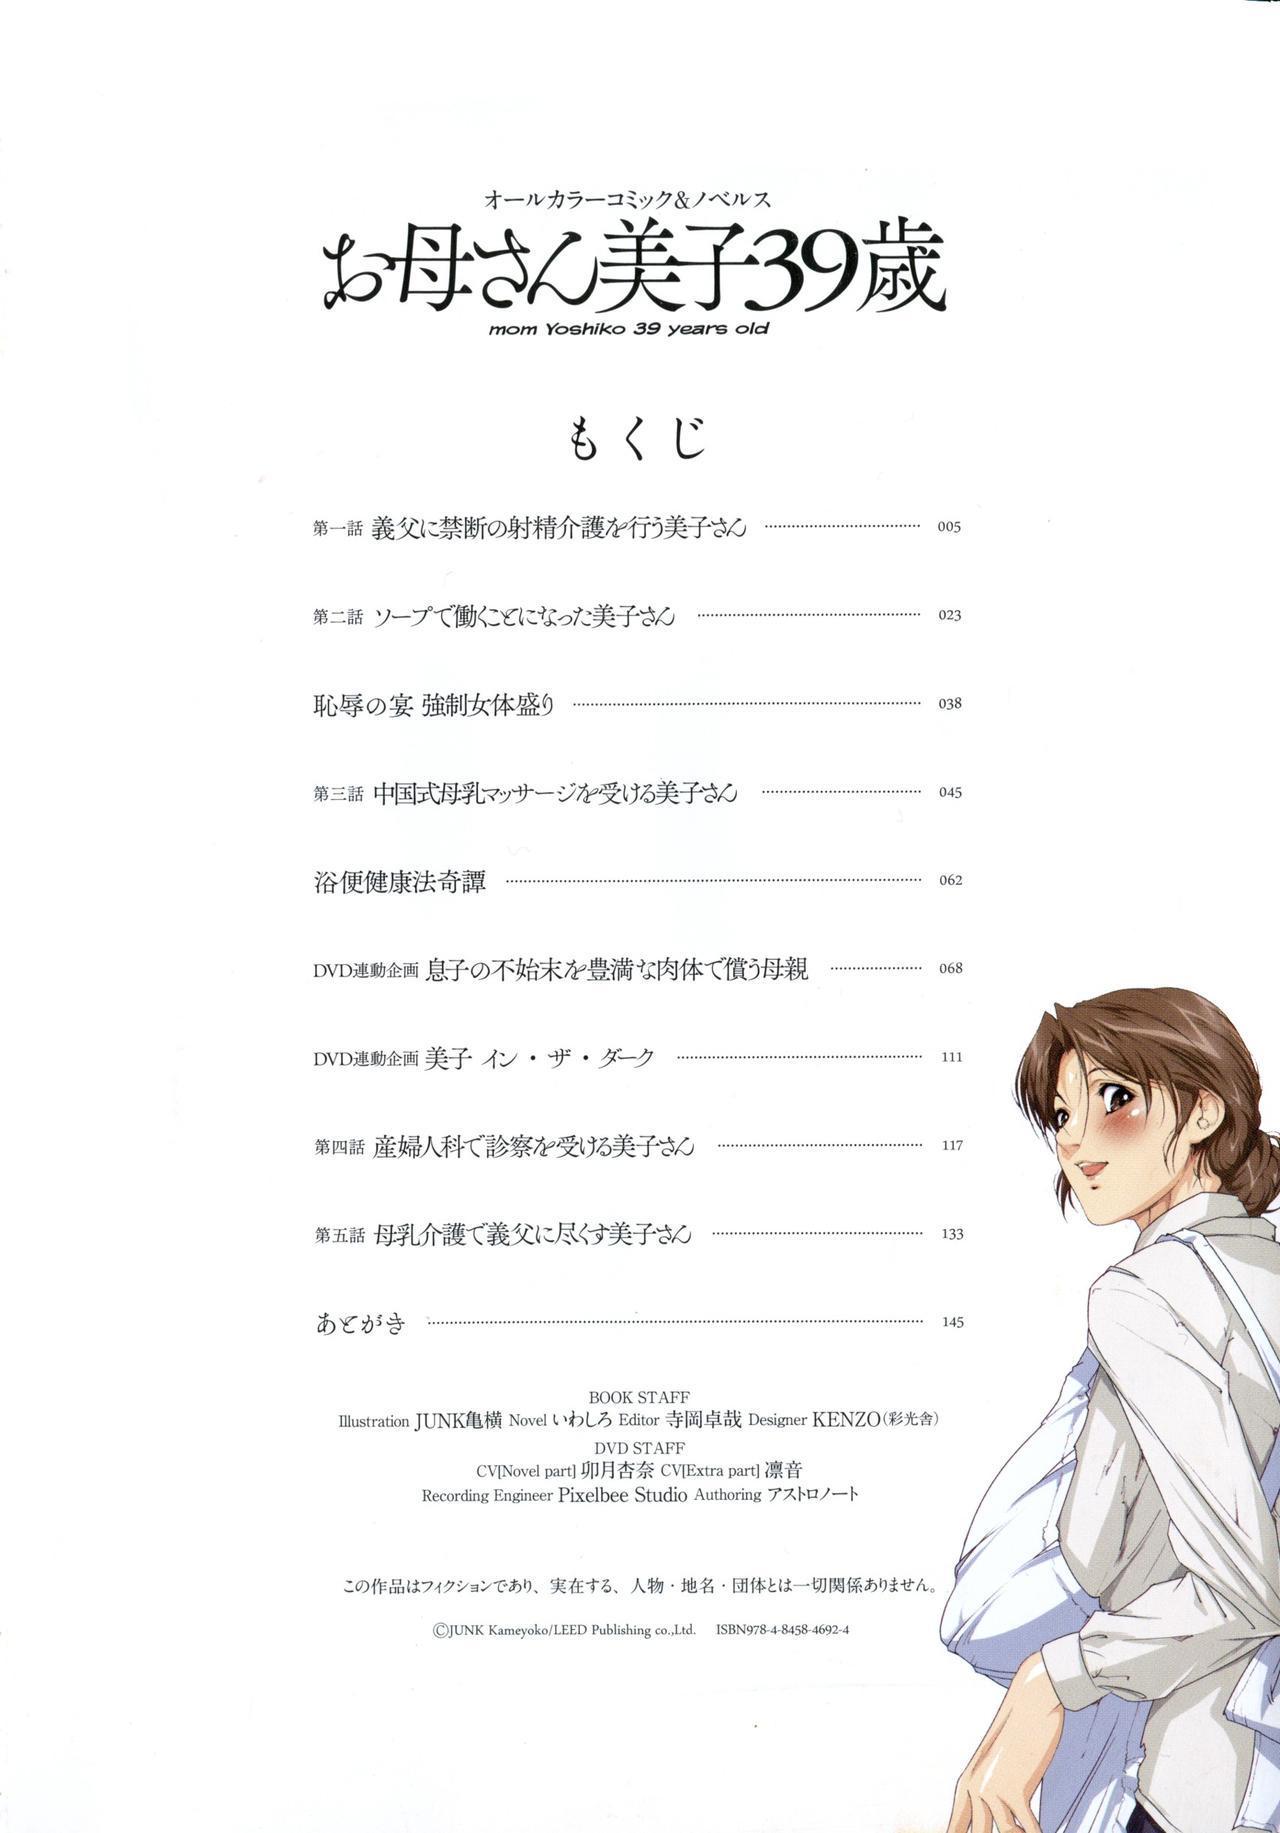 [JUNK Kameyoko] Okaa-san Yoshiko 39-sai Ch. 1 [Chinese] 3